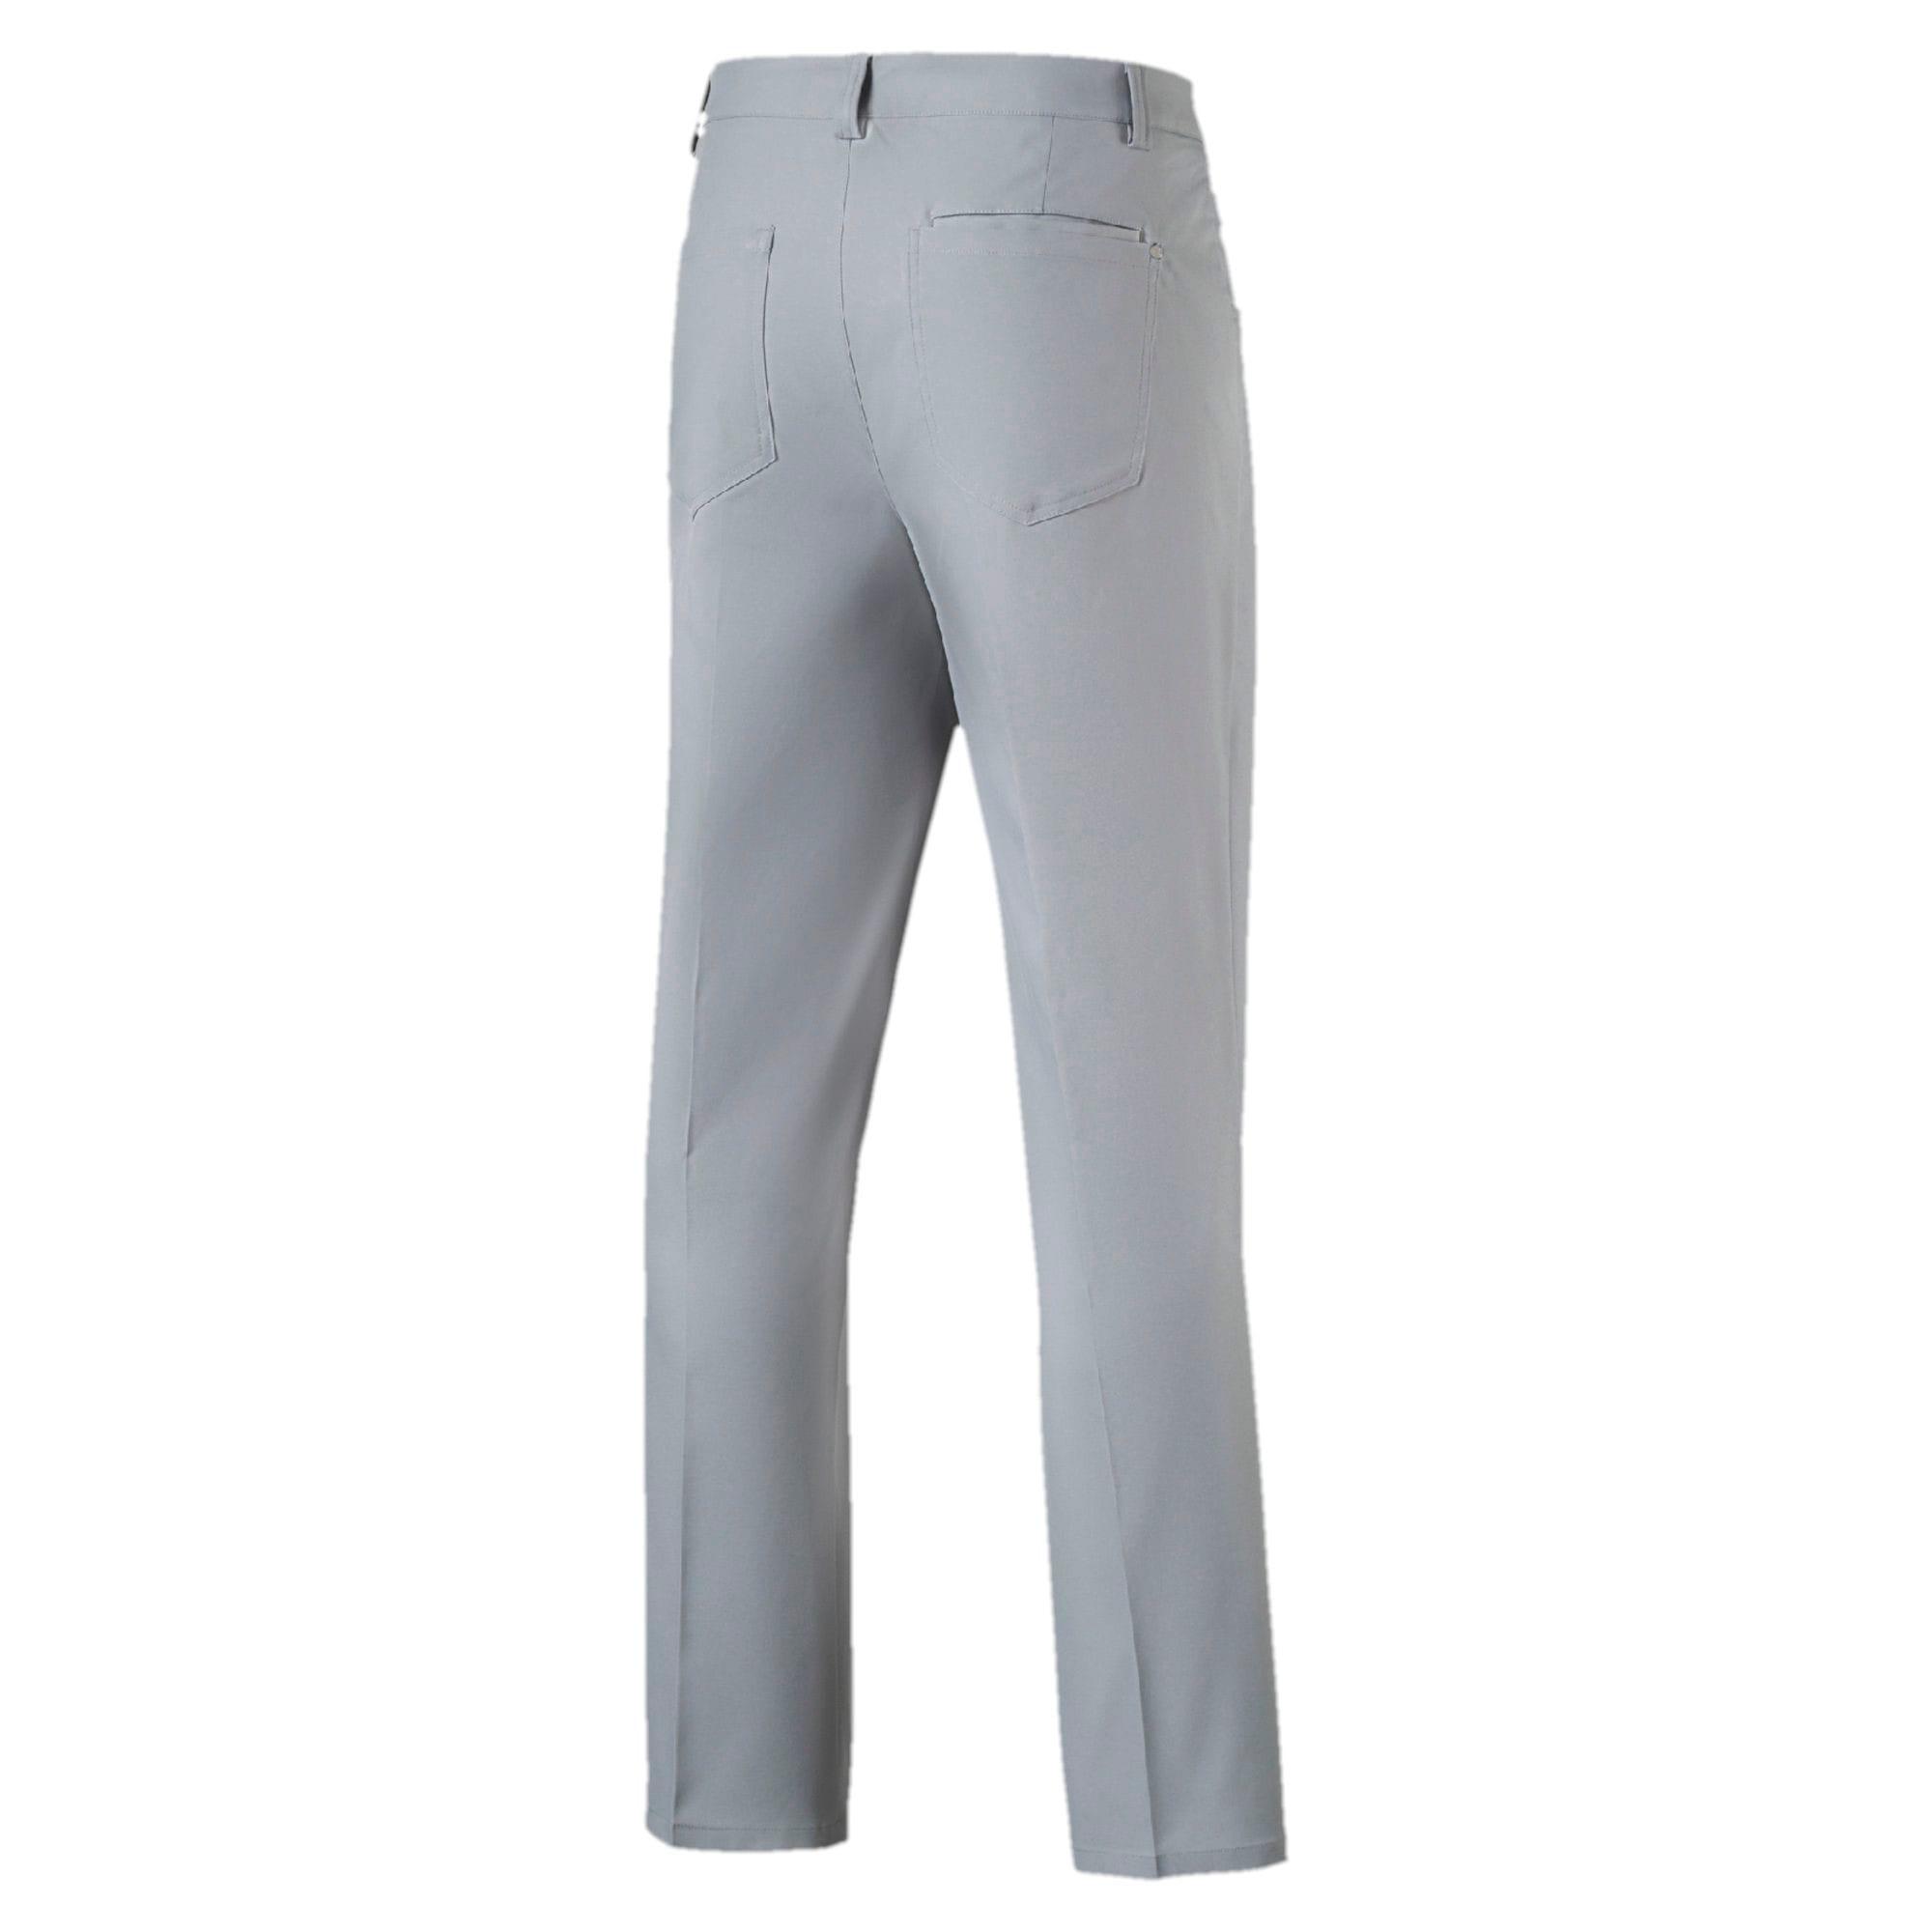 Thumbnail 5 of Men's 6 Pocket Pants, Quarry, medium